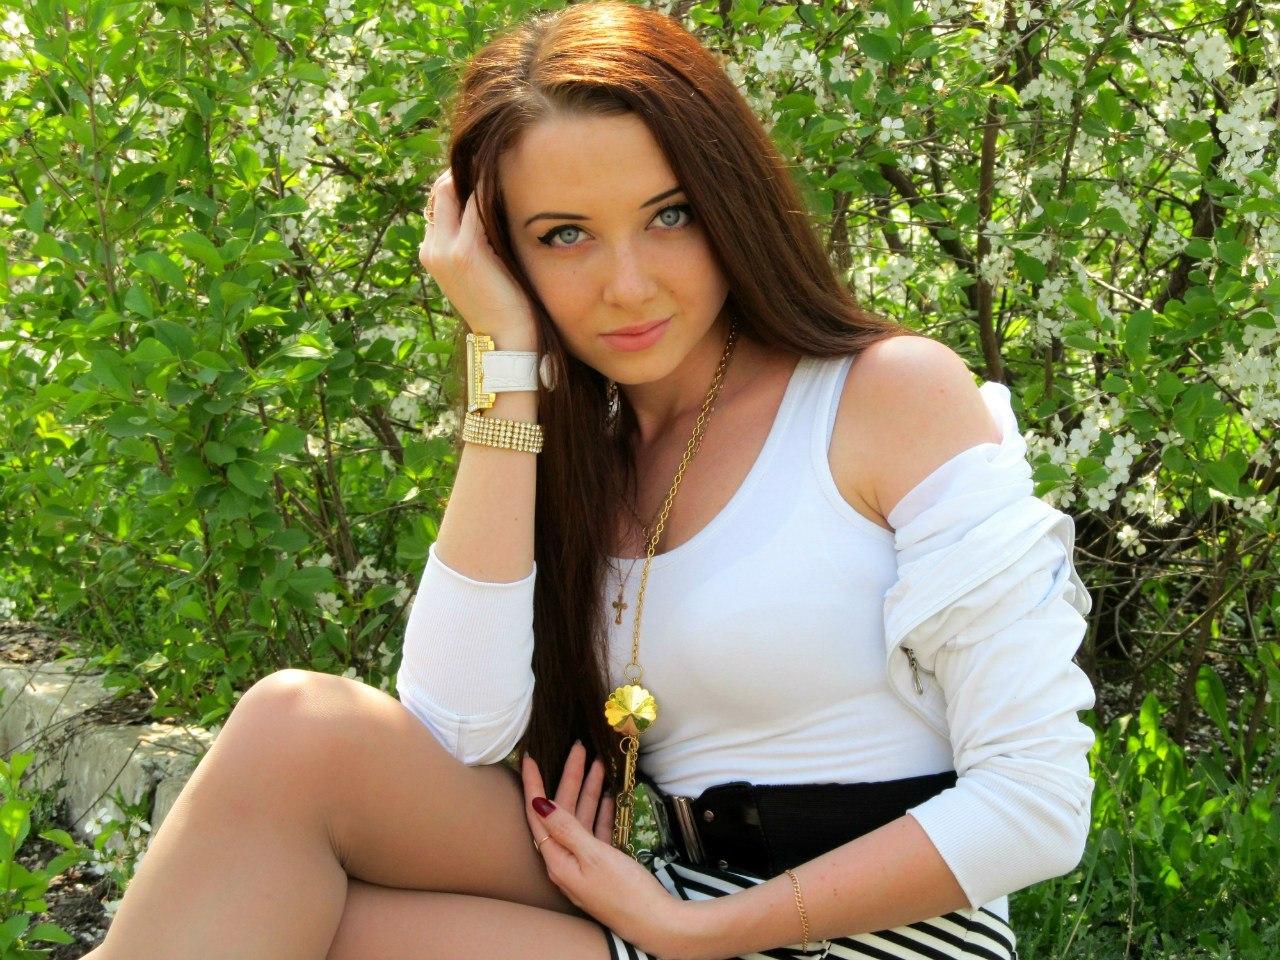 Телочки из контакта, фото эротика девушки селфиВКонтакте 25 фотография